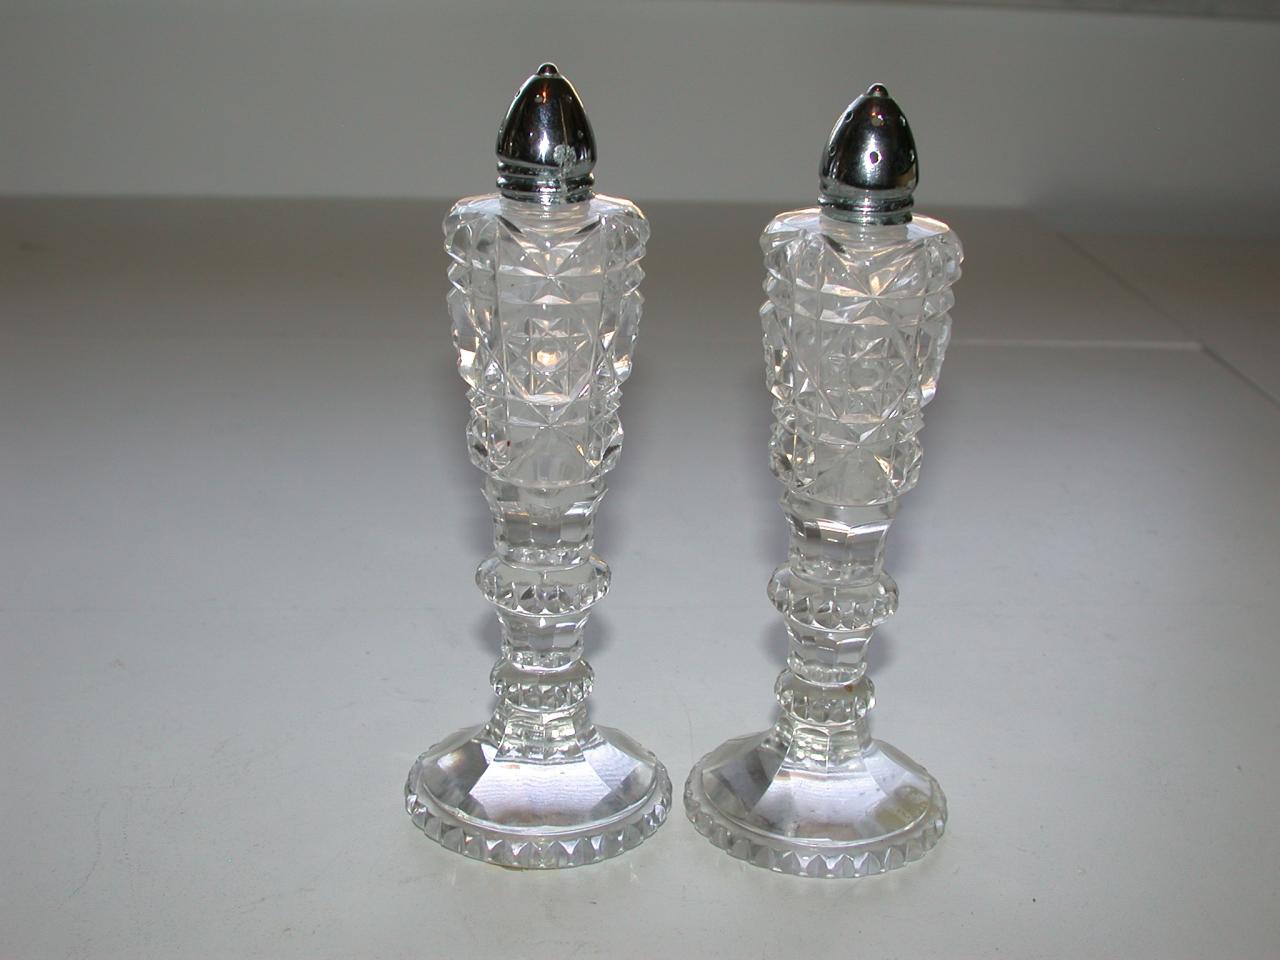 Simply Elegant Cut Crystal Glass Salt Pepper Shakers Set